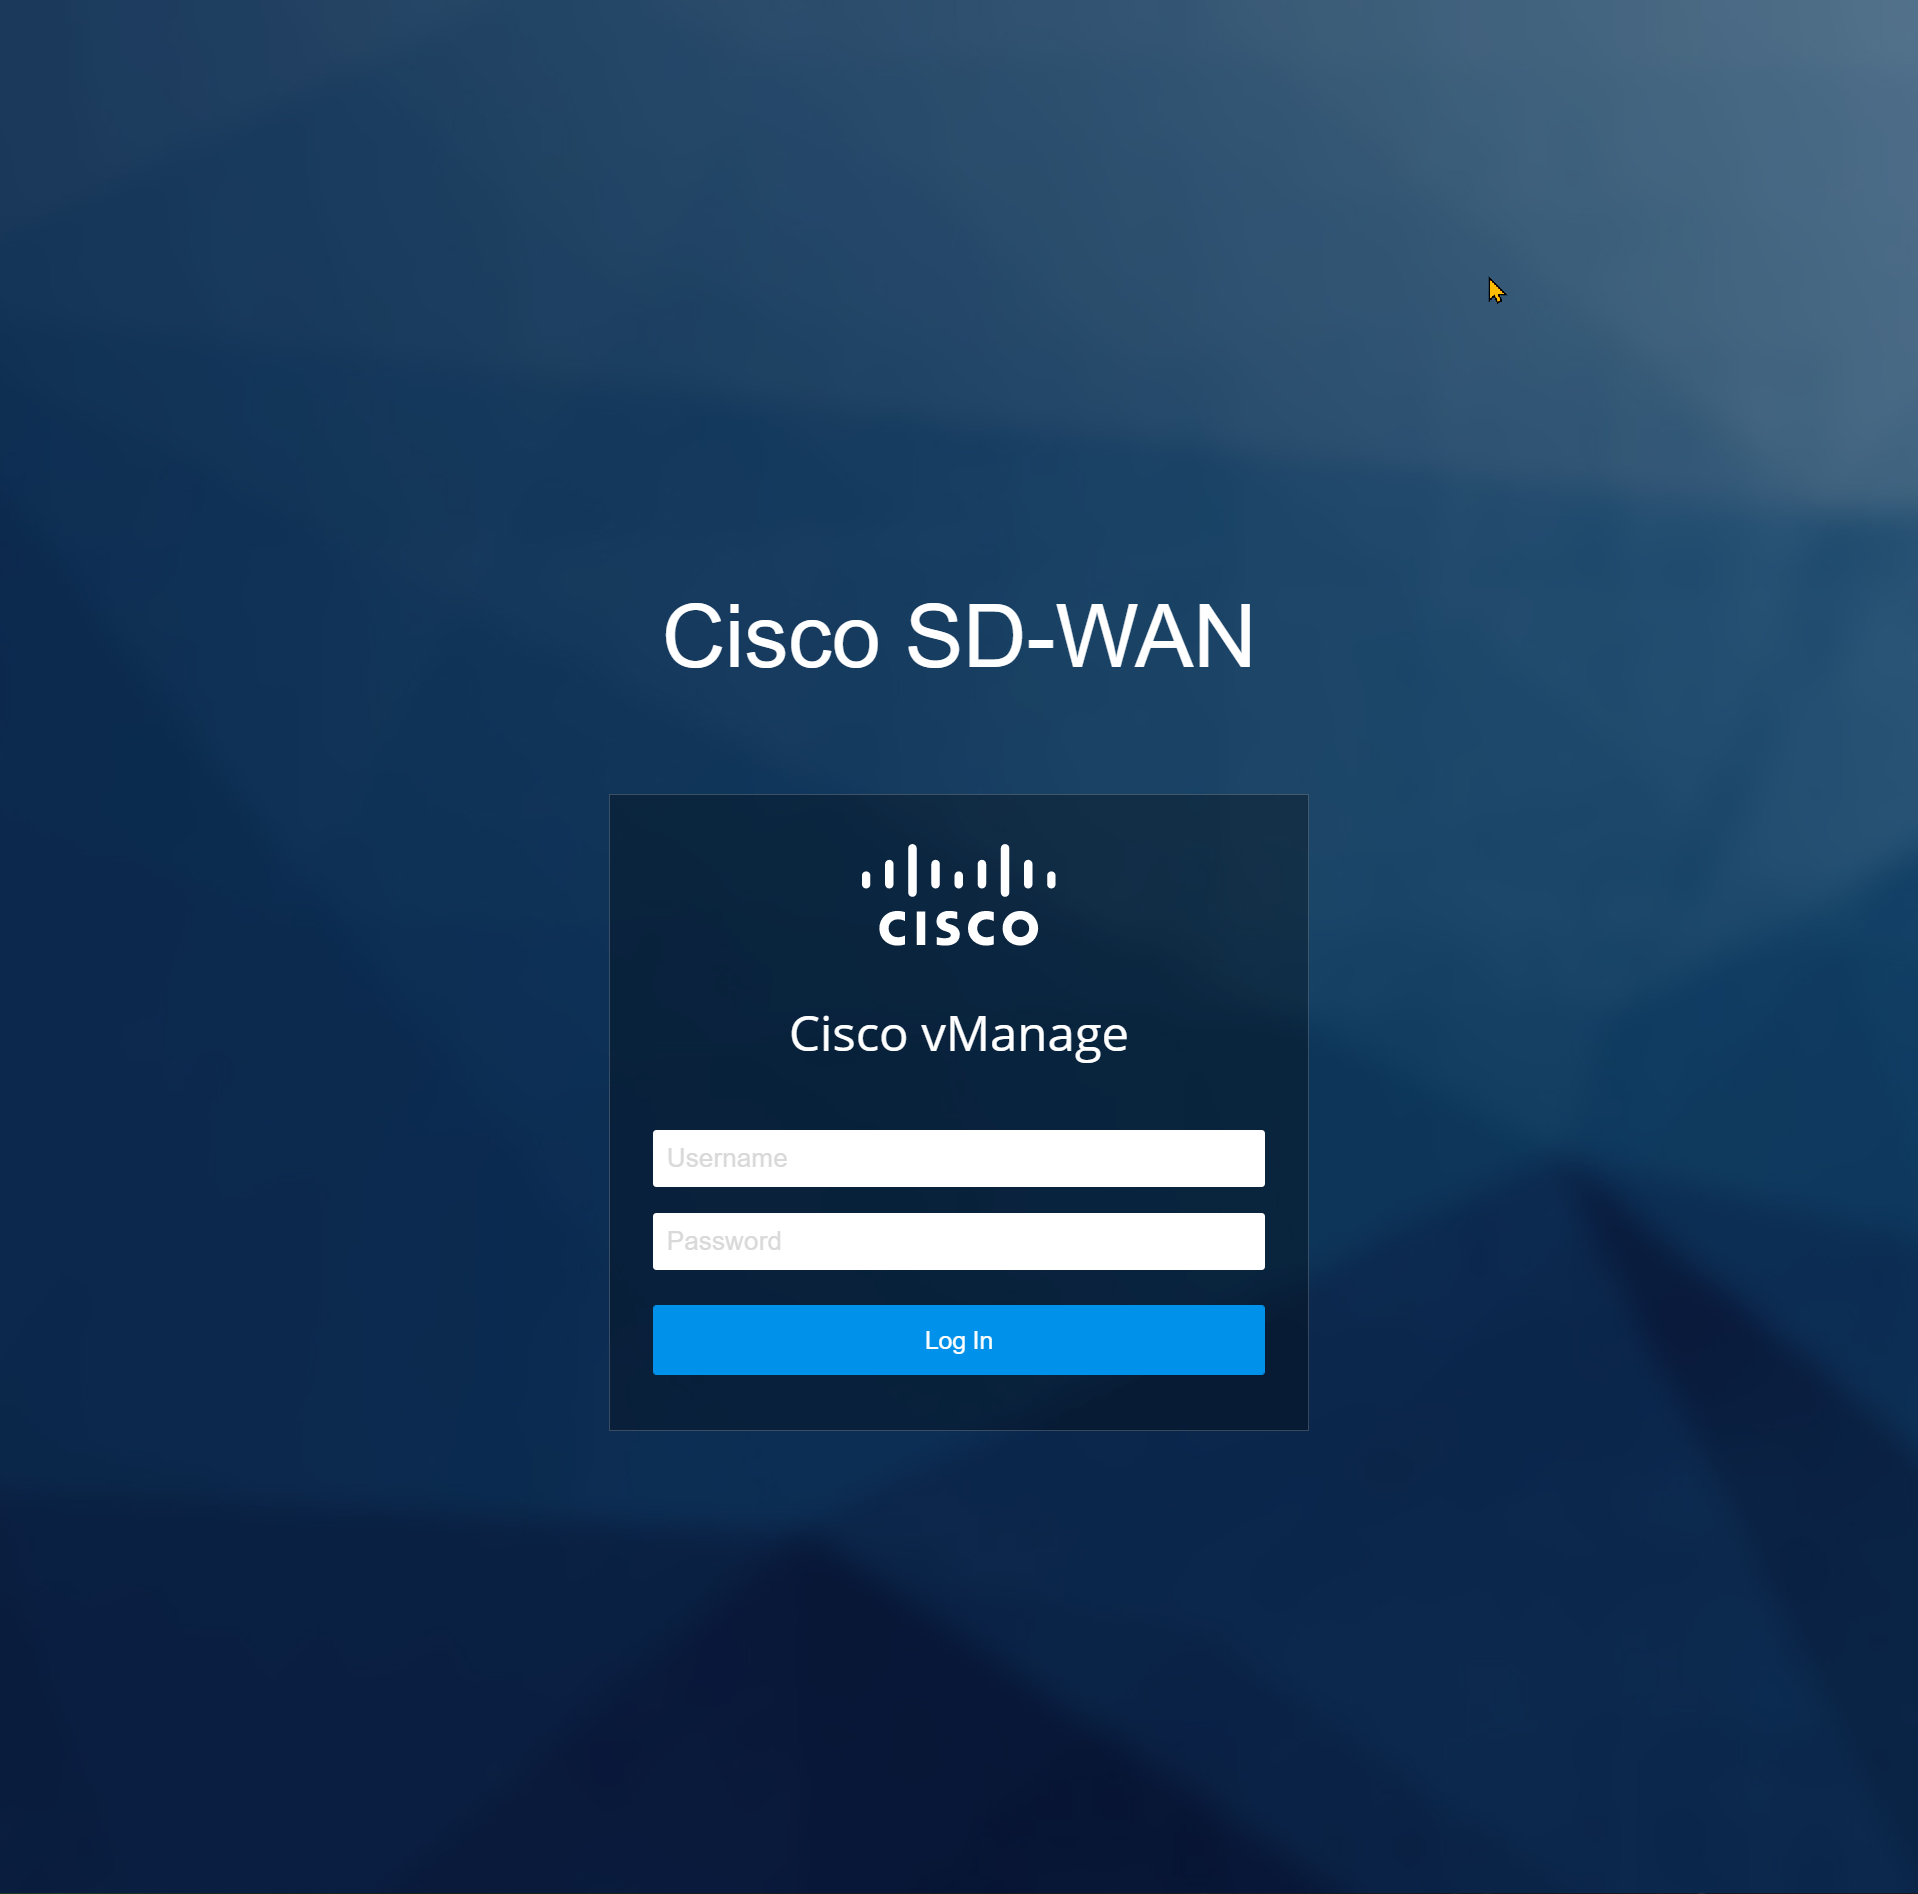 cisco-sd-wan-viptela-vmanage-login-screen